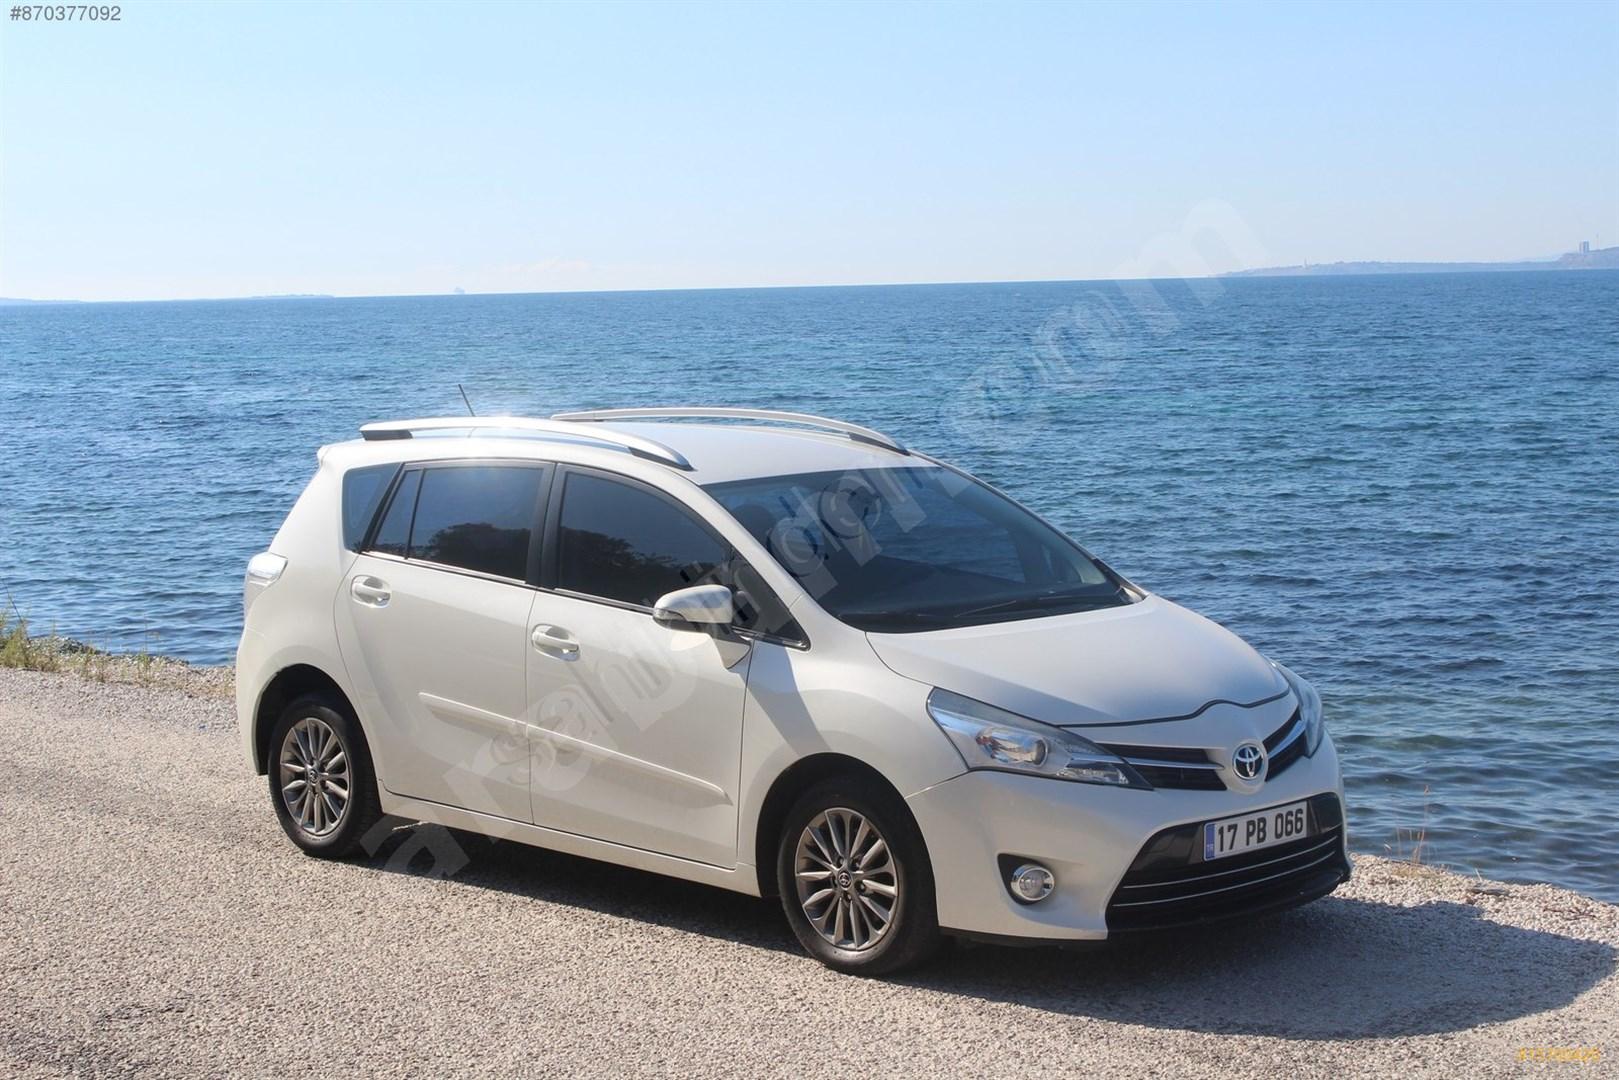 Sahibinden Toyota Verso 1 6 D 4d Advance 2016 Model Canakkale 75 000 Km Beyaz 15700420 Arabam Com